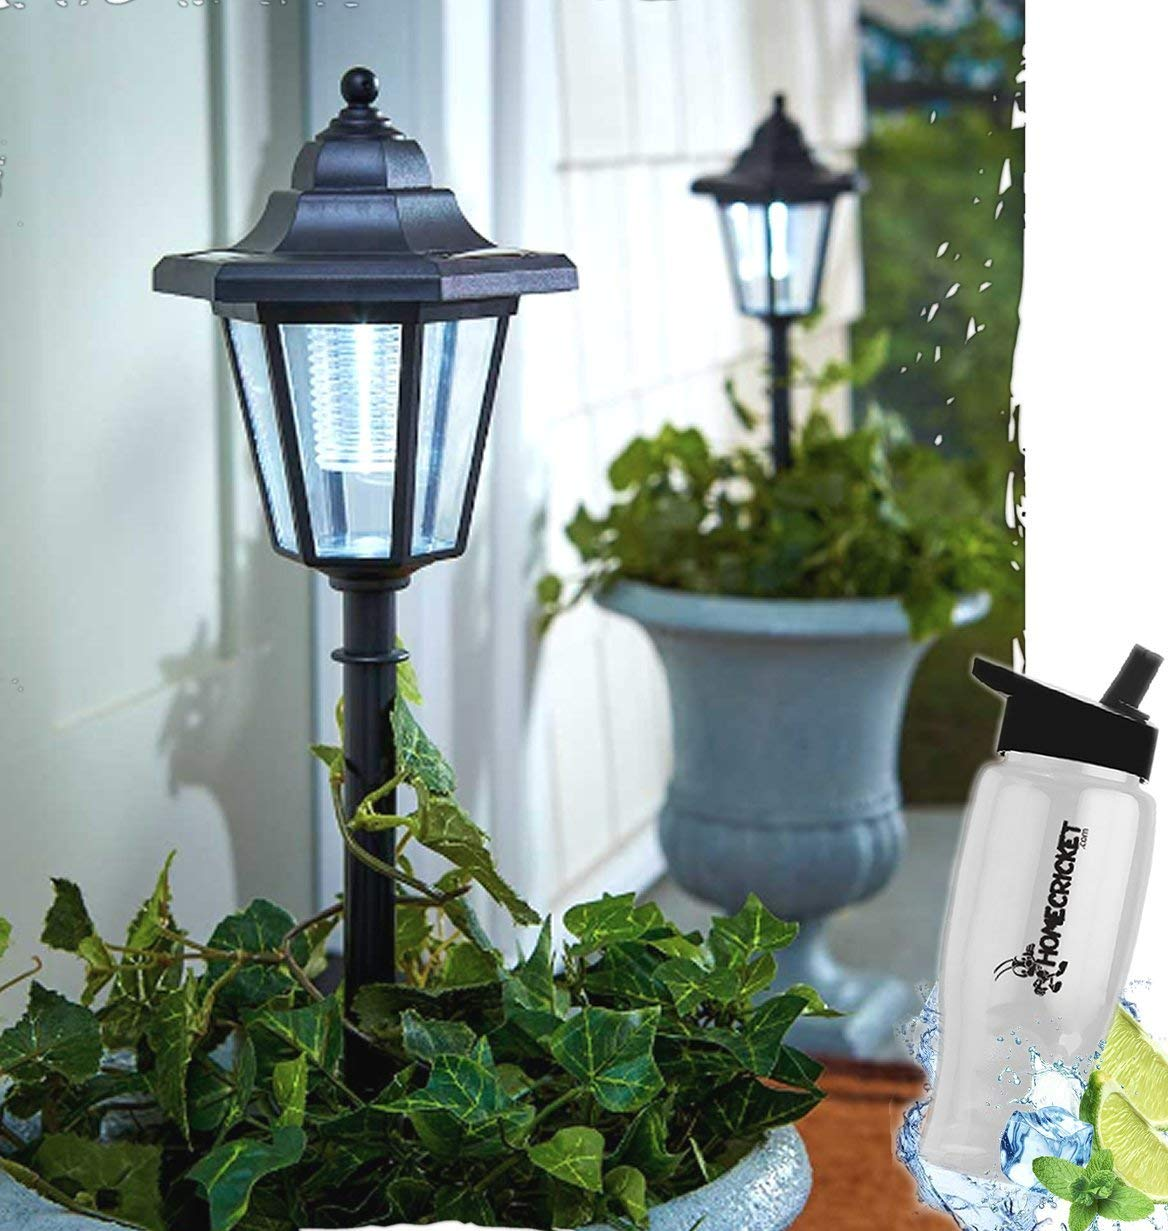 Cheap Solar Lanterns Lowes Find Solar Lanterns Lowes Deals On Line At Alibaba Com